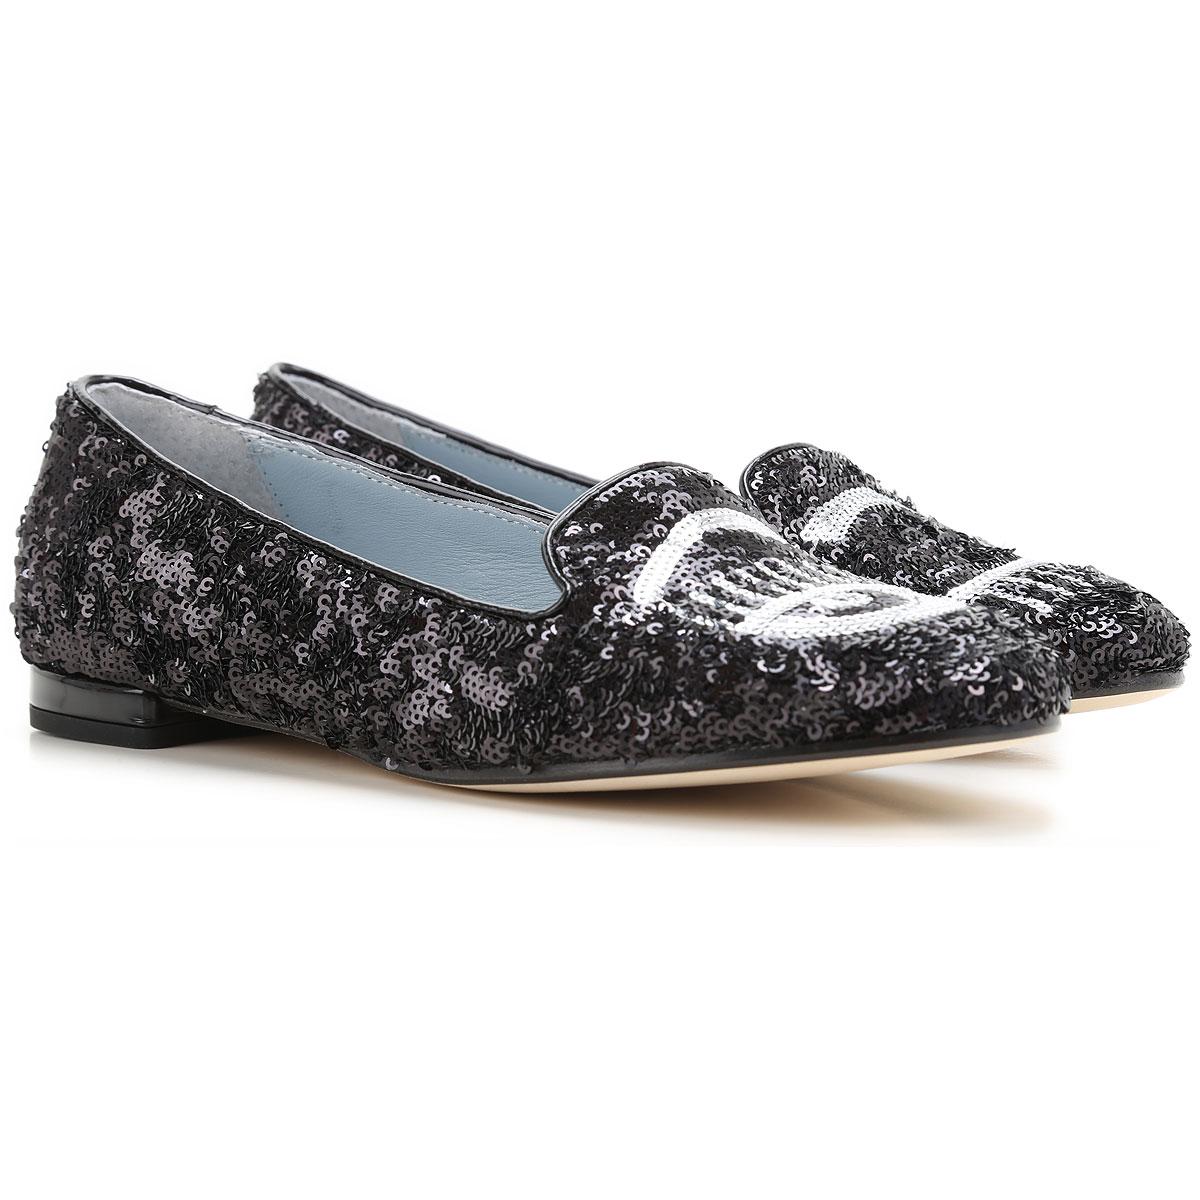 Womens Shoes Chiara Ferragni Style code cf1219 364334